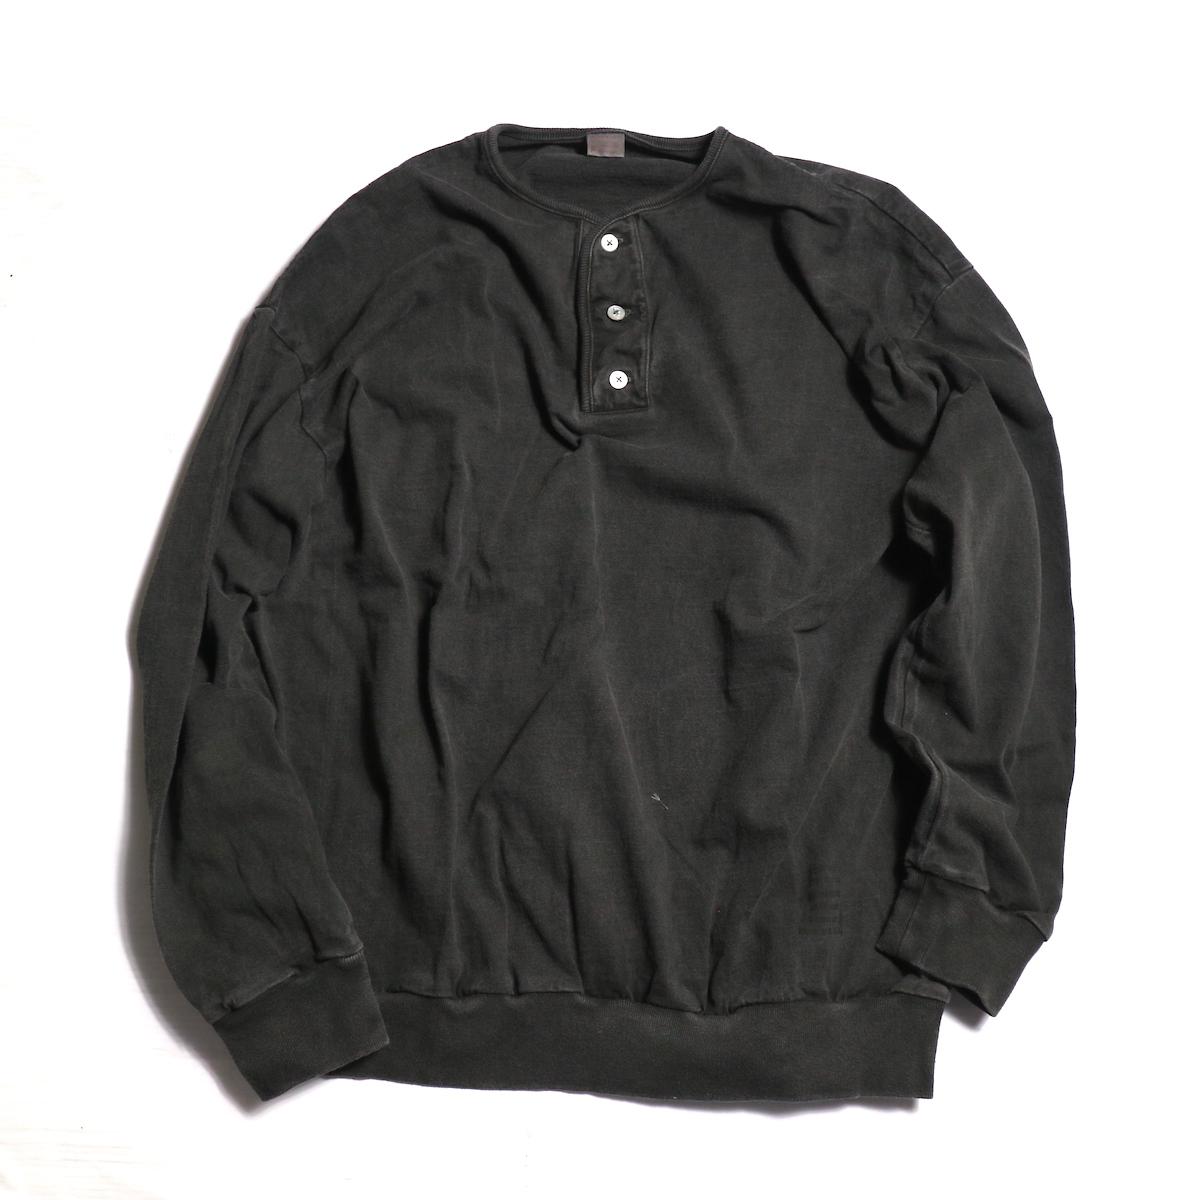 TOWN CRAFT / WIDE SILHOUETTE 3B HENLEY NECK L/S T-SHIRT -Black